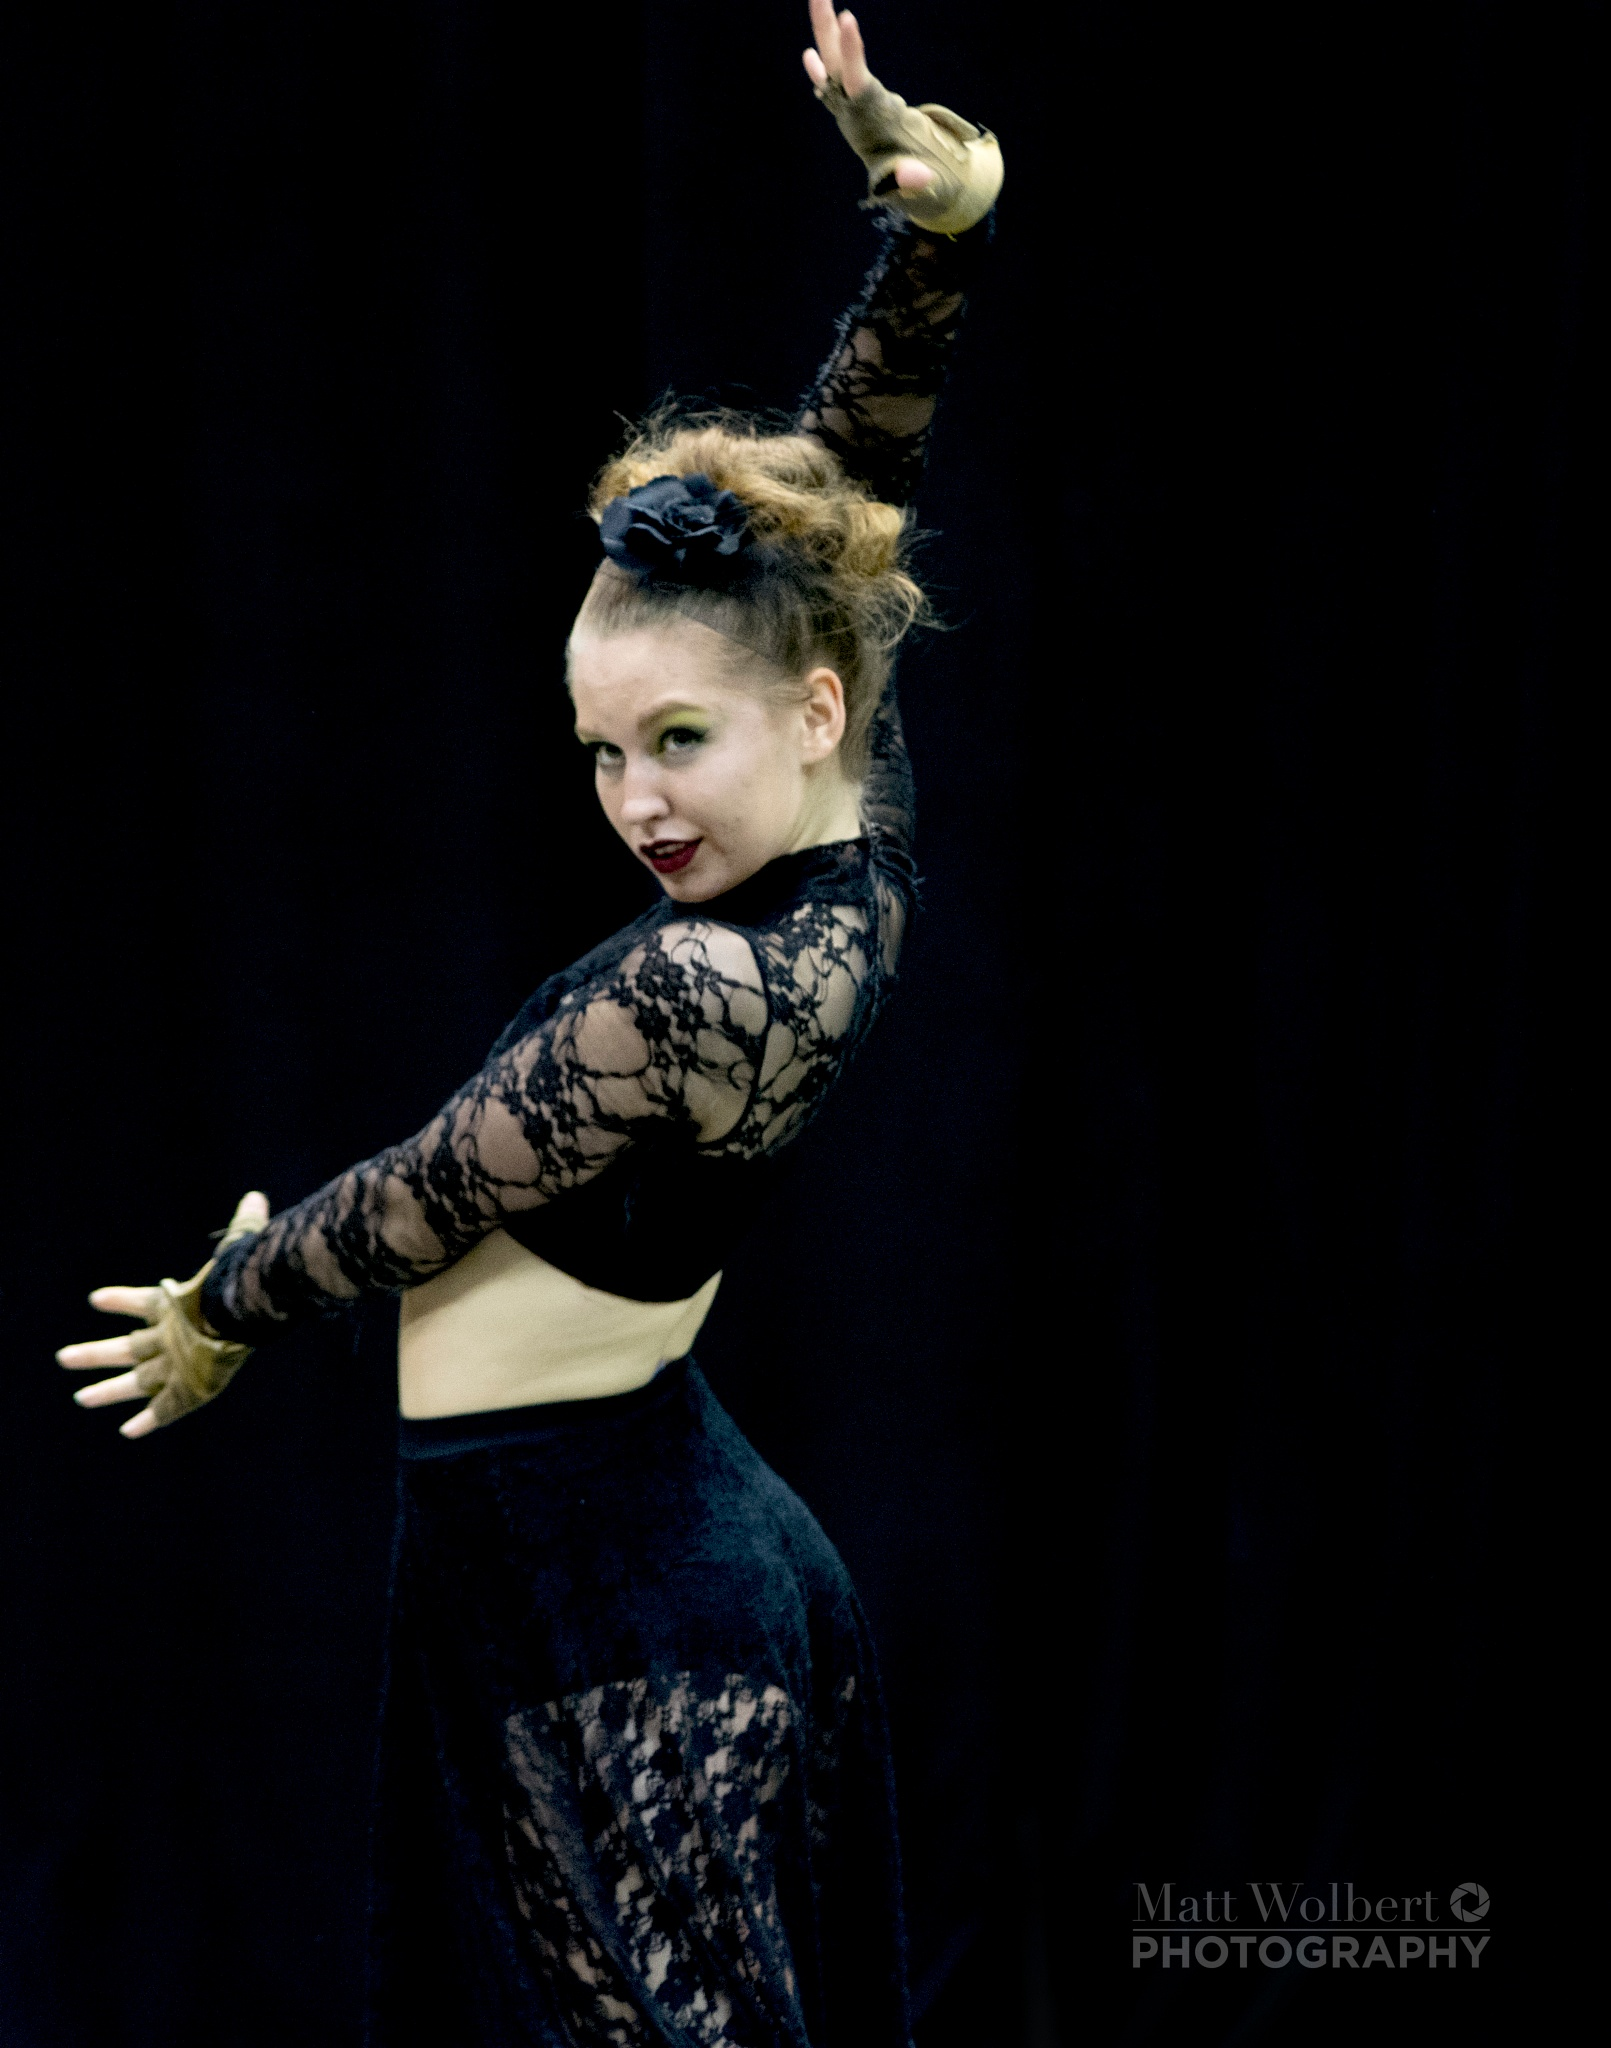 Mad dancing skills  by Matt Wolbert Photography